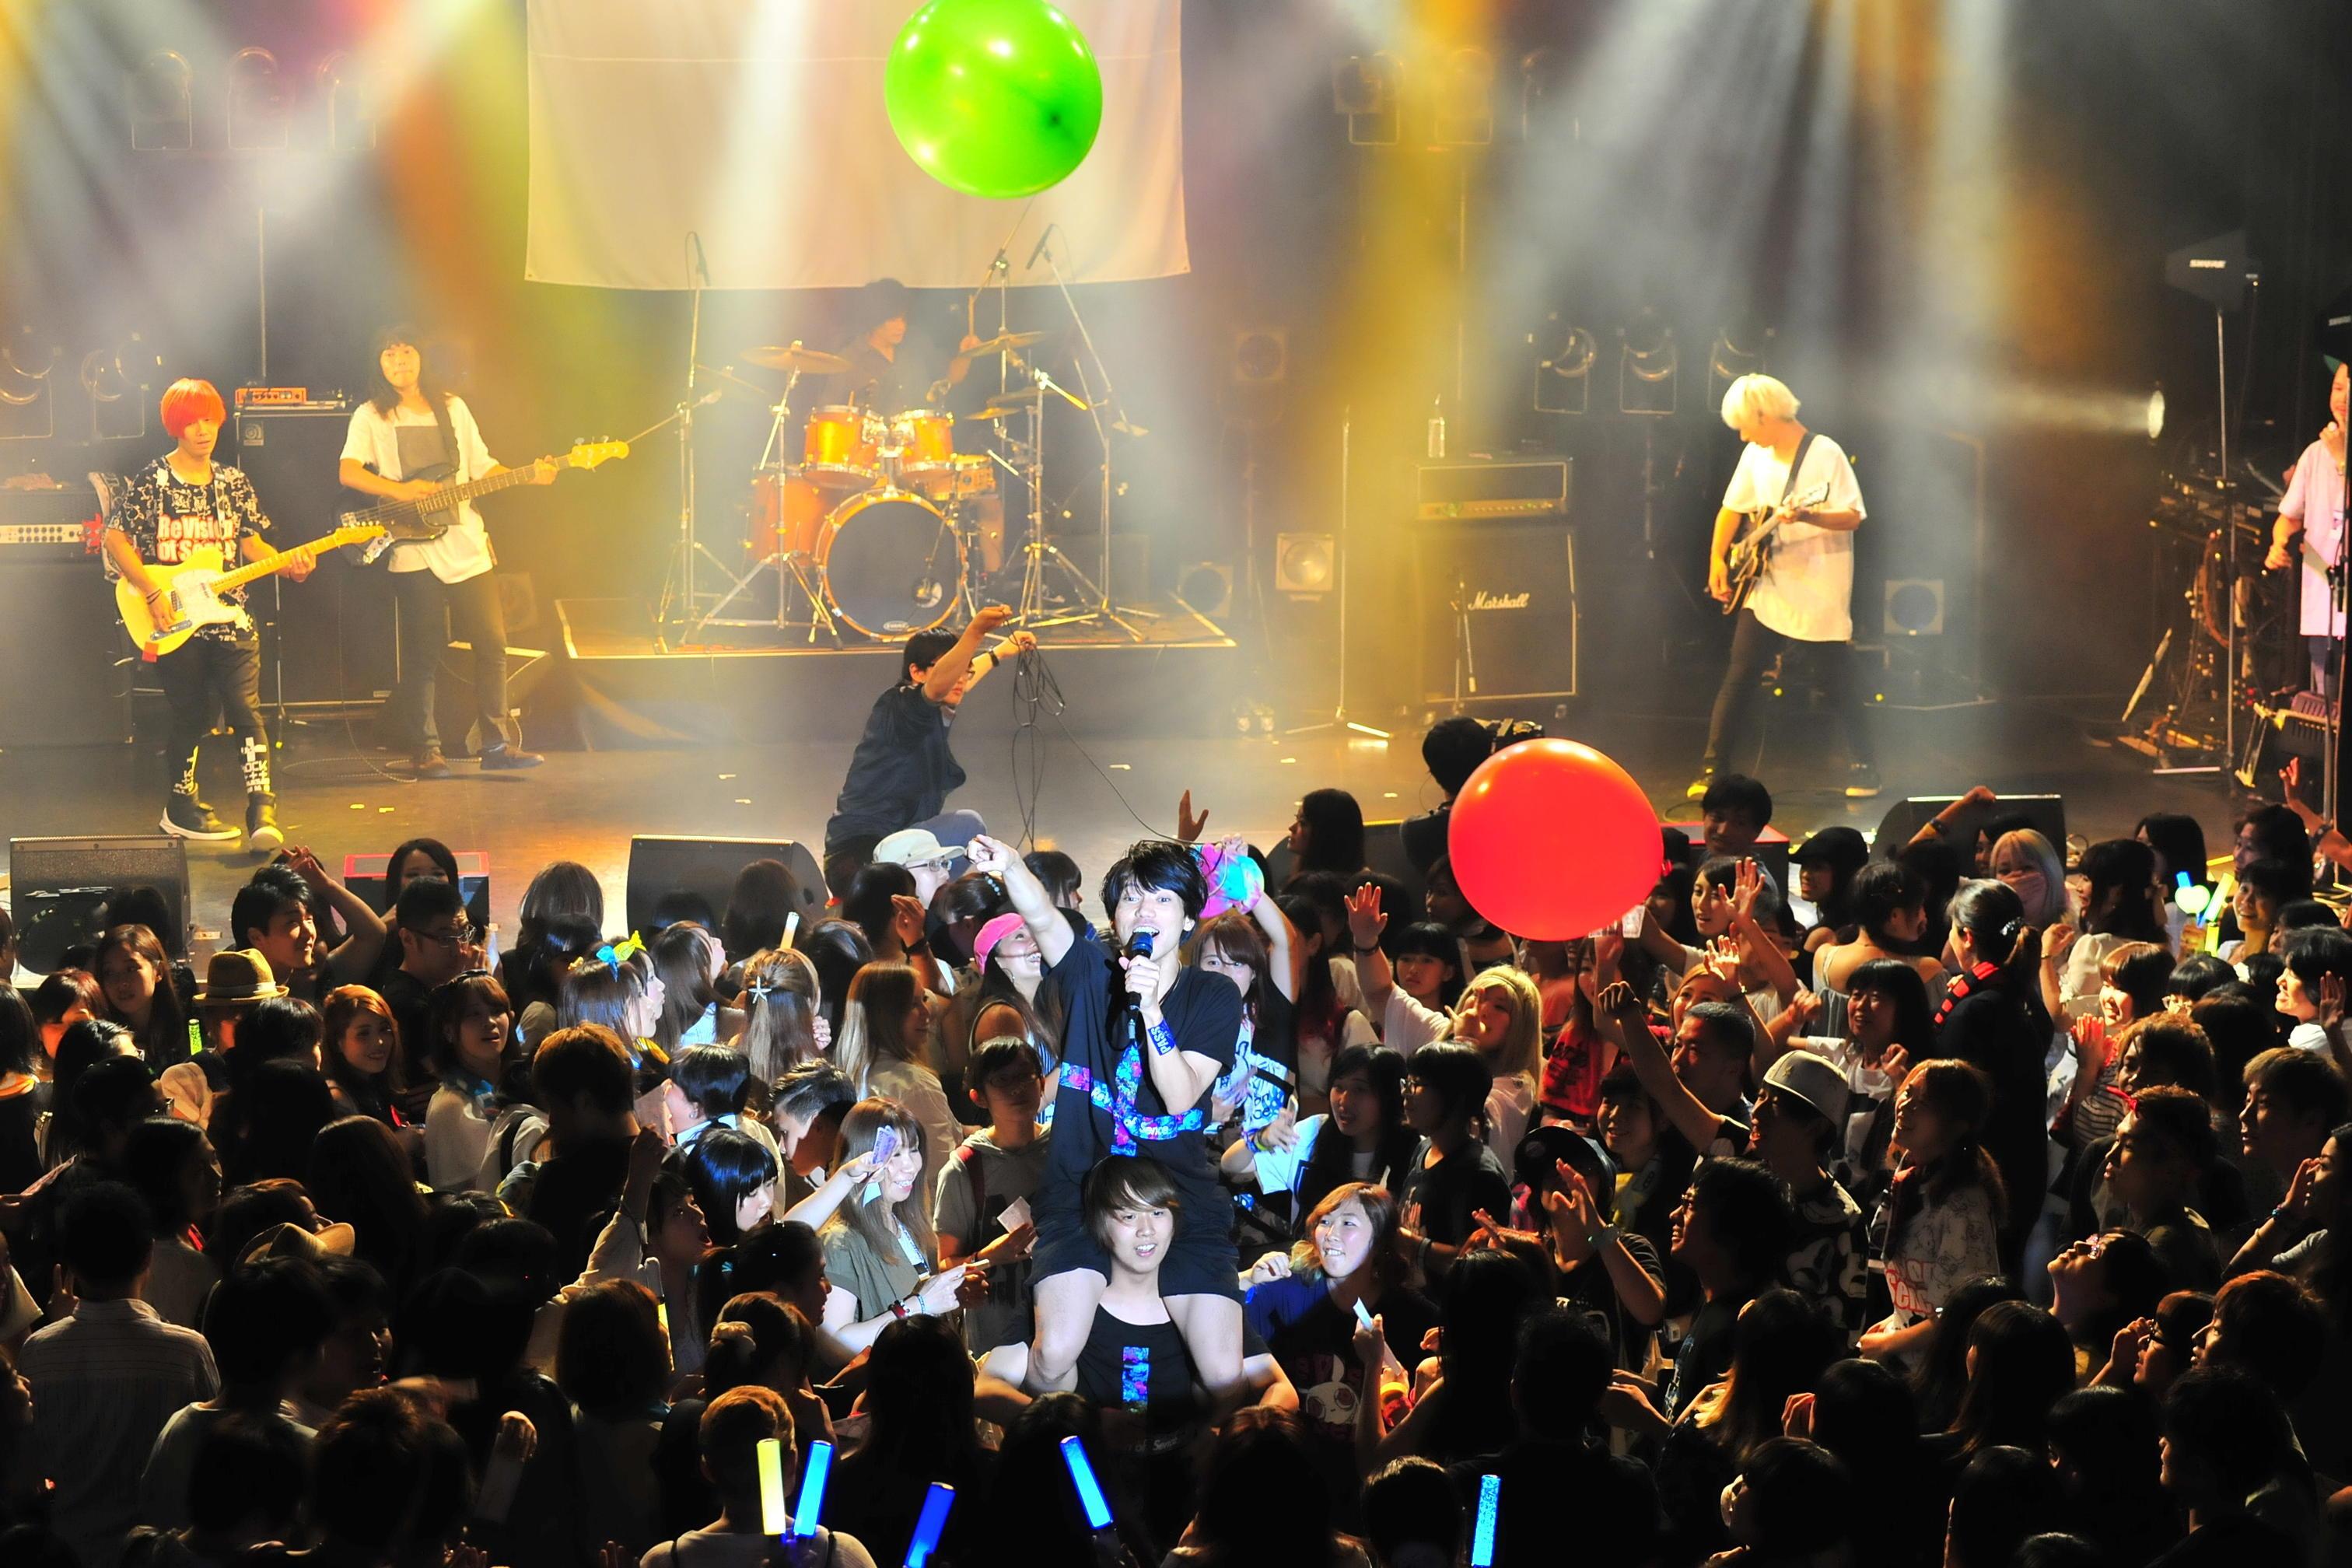 http://news.yoshimoto.co.jp/20160730200311-1c6e02383e78cc14993359a7126351aff215e9ce.jpg